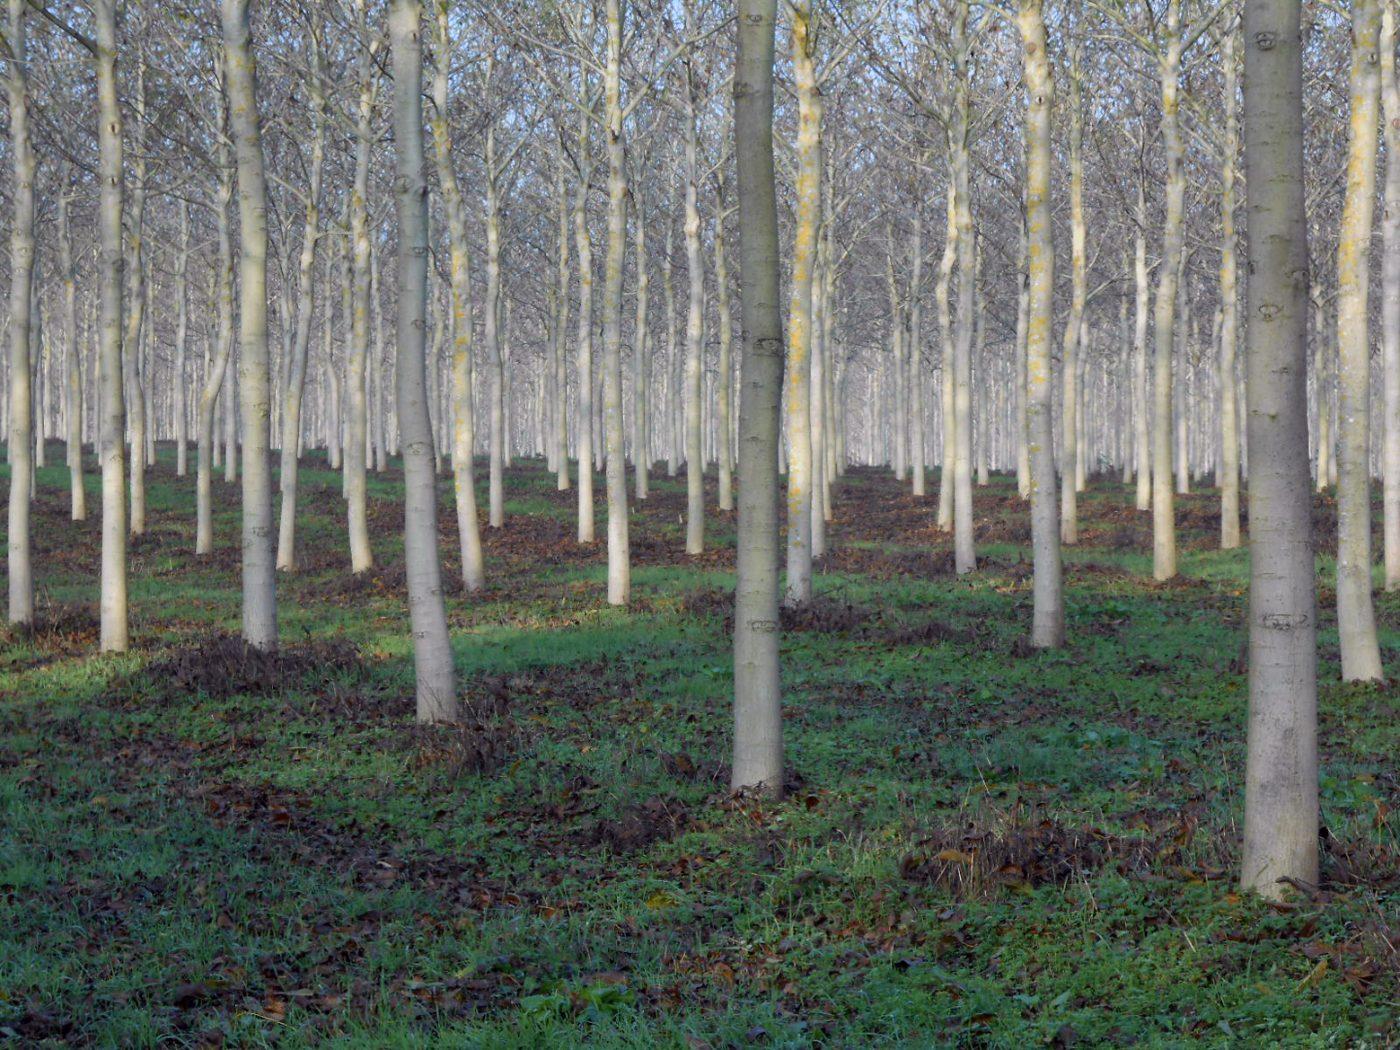 Emergencia climática, reforestar nunca fue tan importante